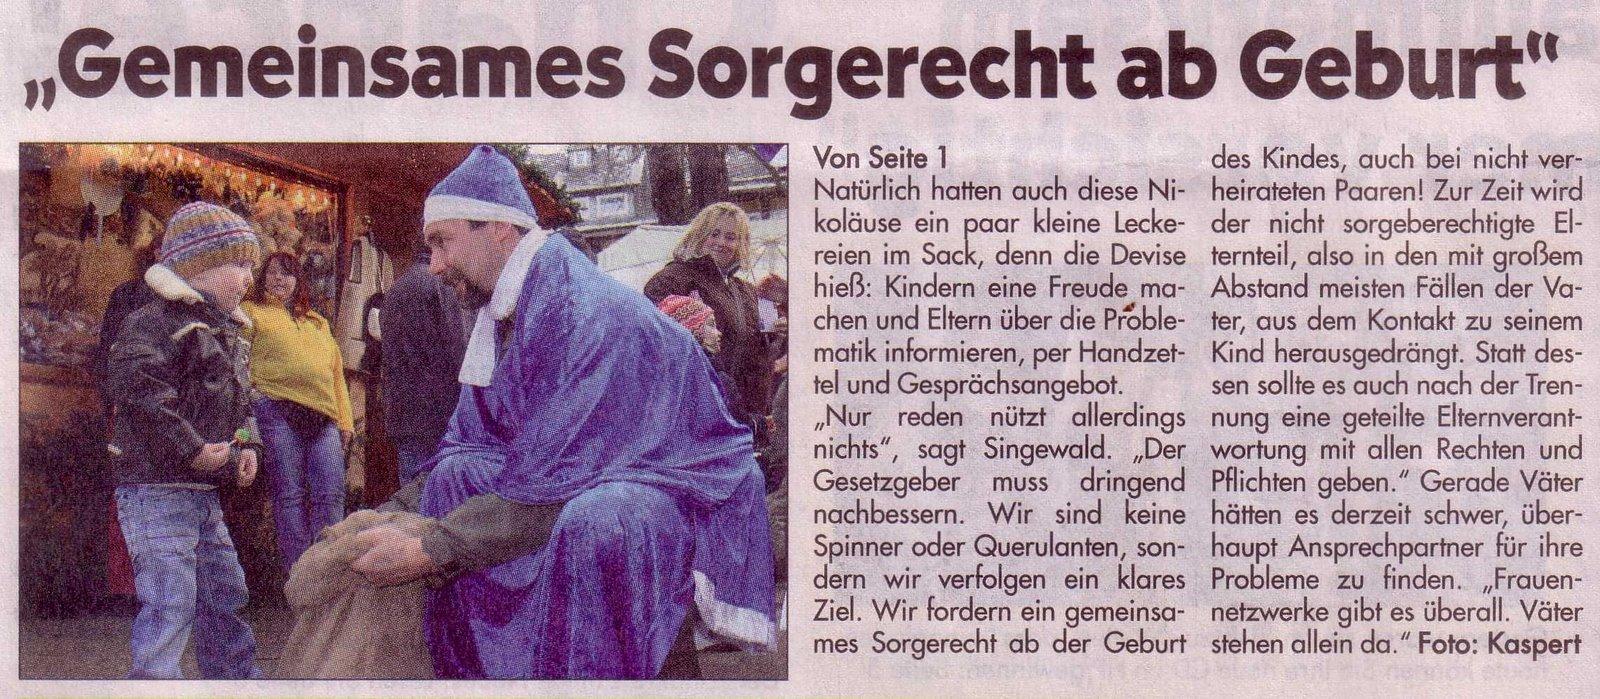 [1412-goslar-Sorgerecht-ab-Geburt-u13186w208.jpg]